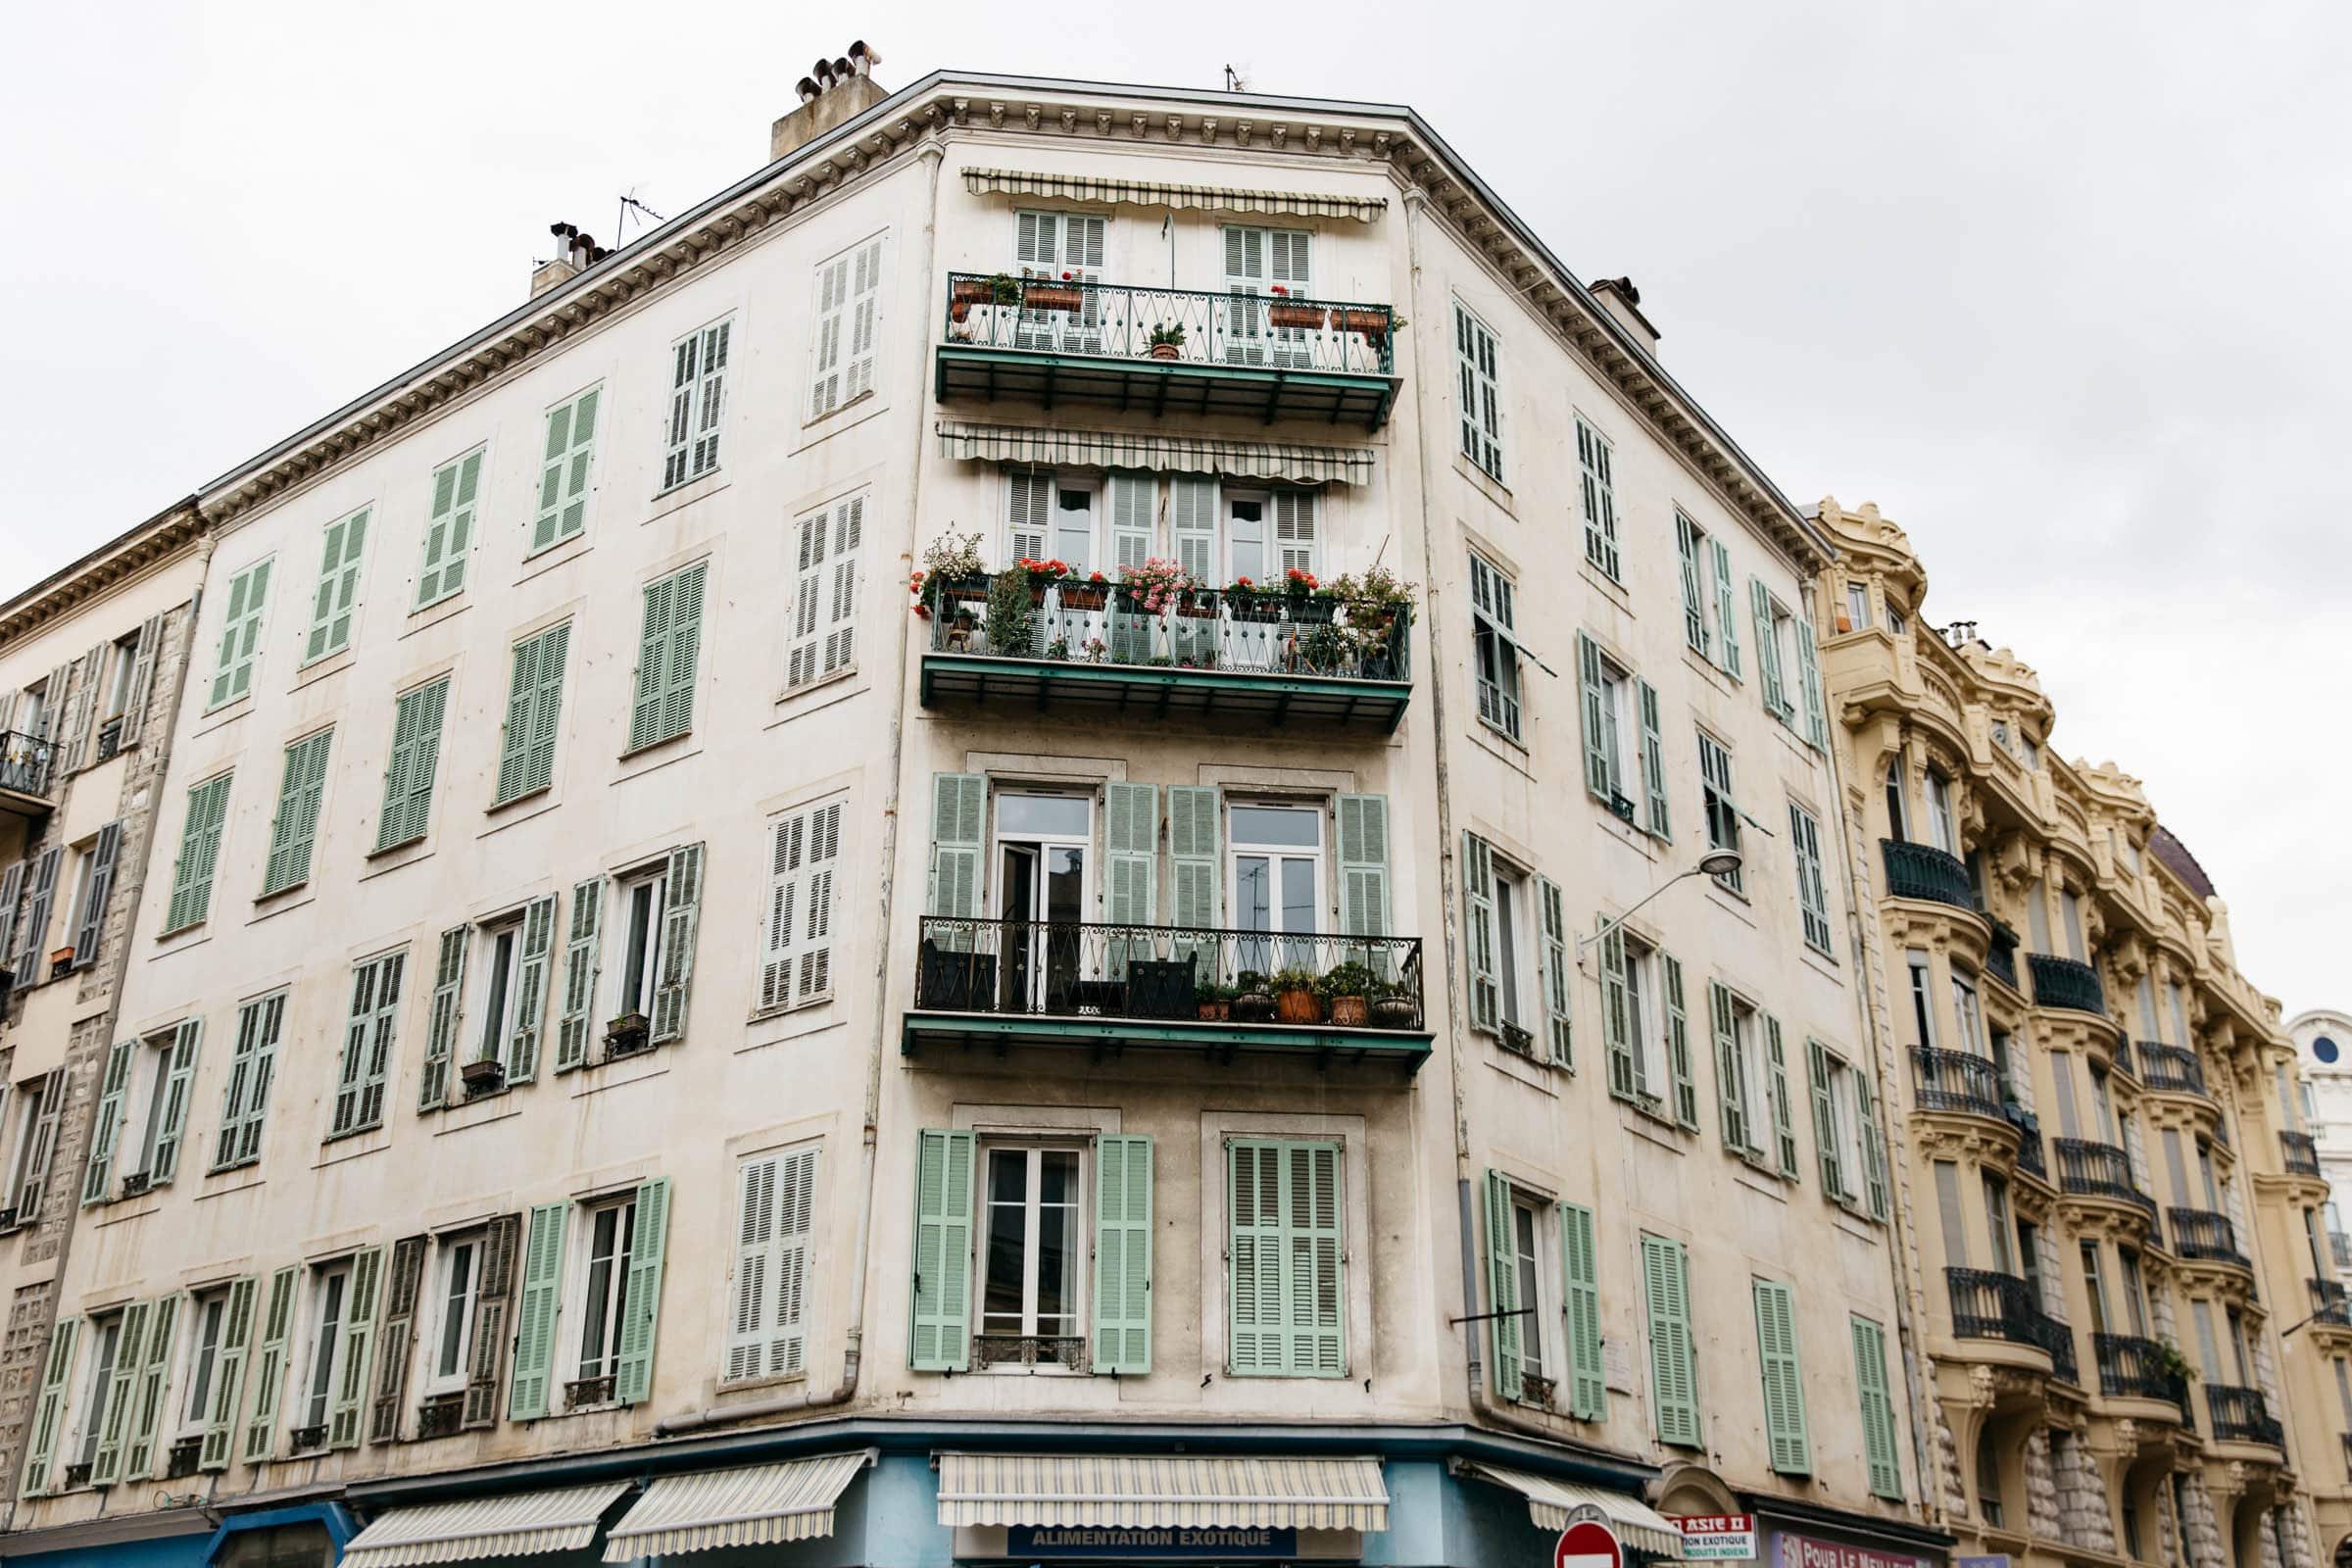 Visiting Nice France